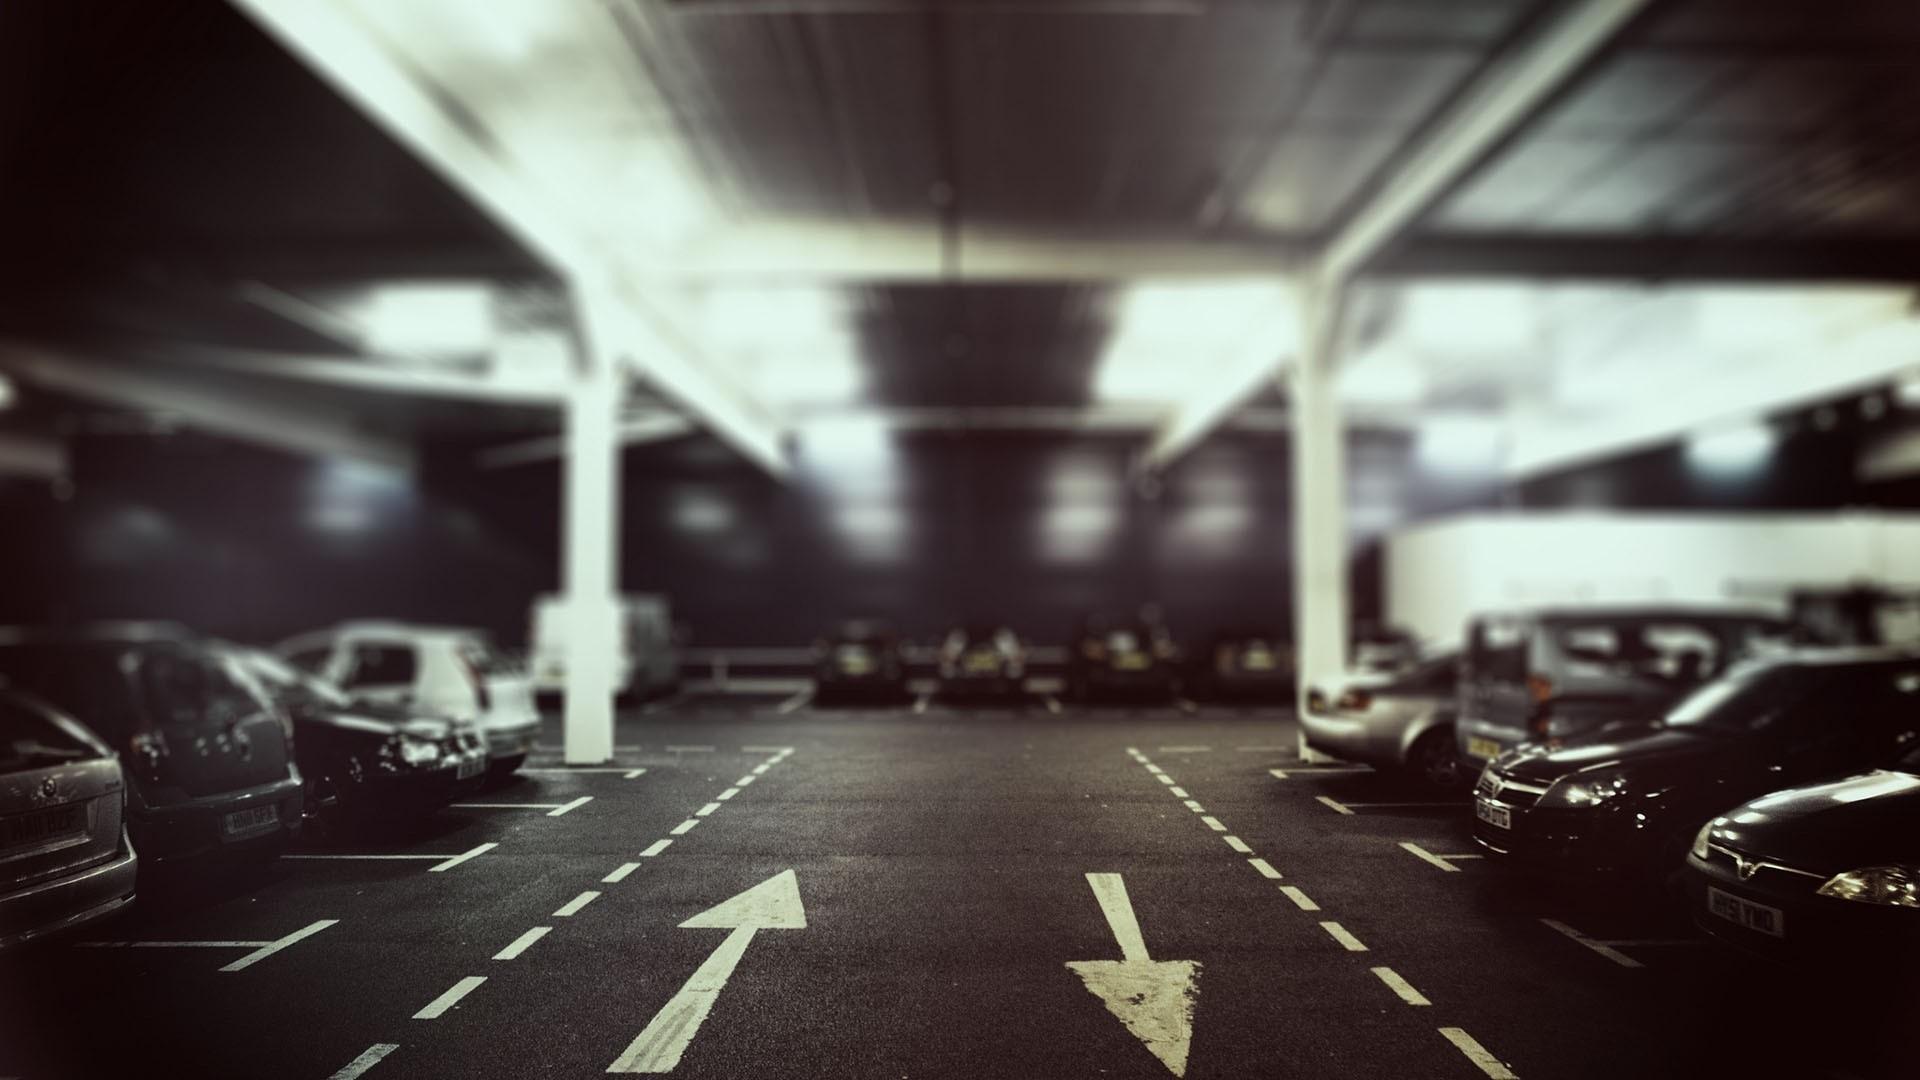 Free Parking Lot Wallpaper